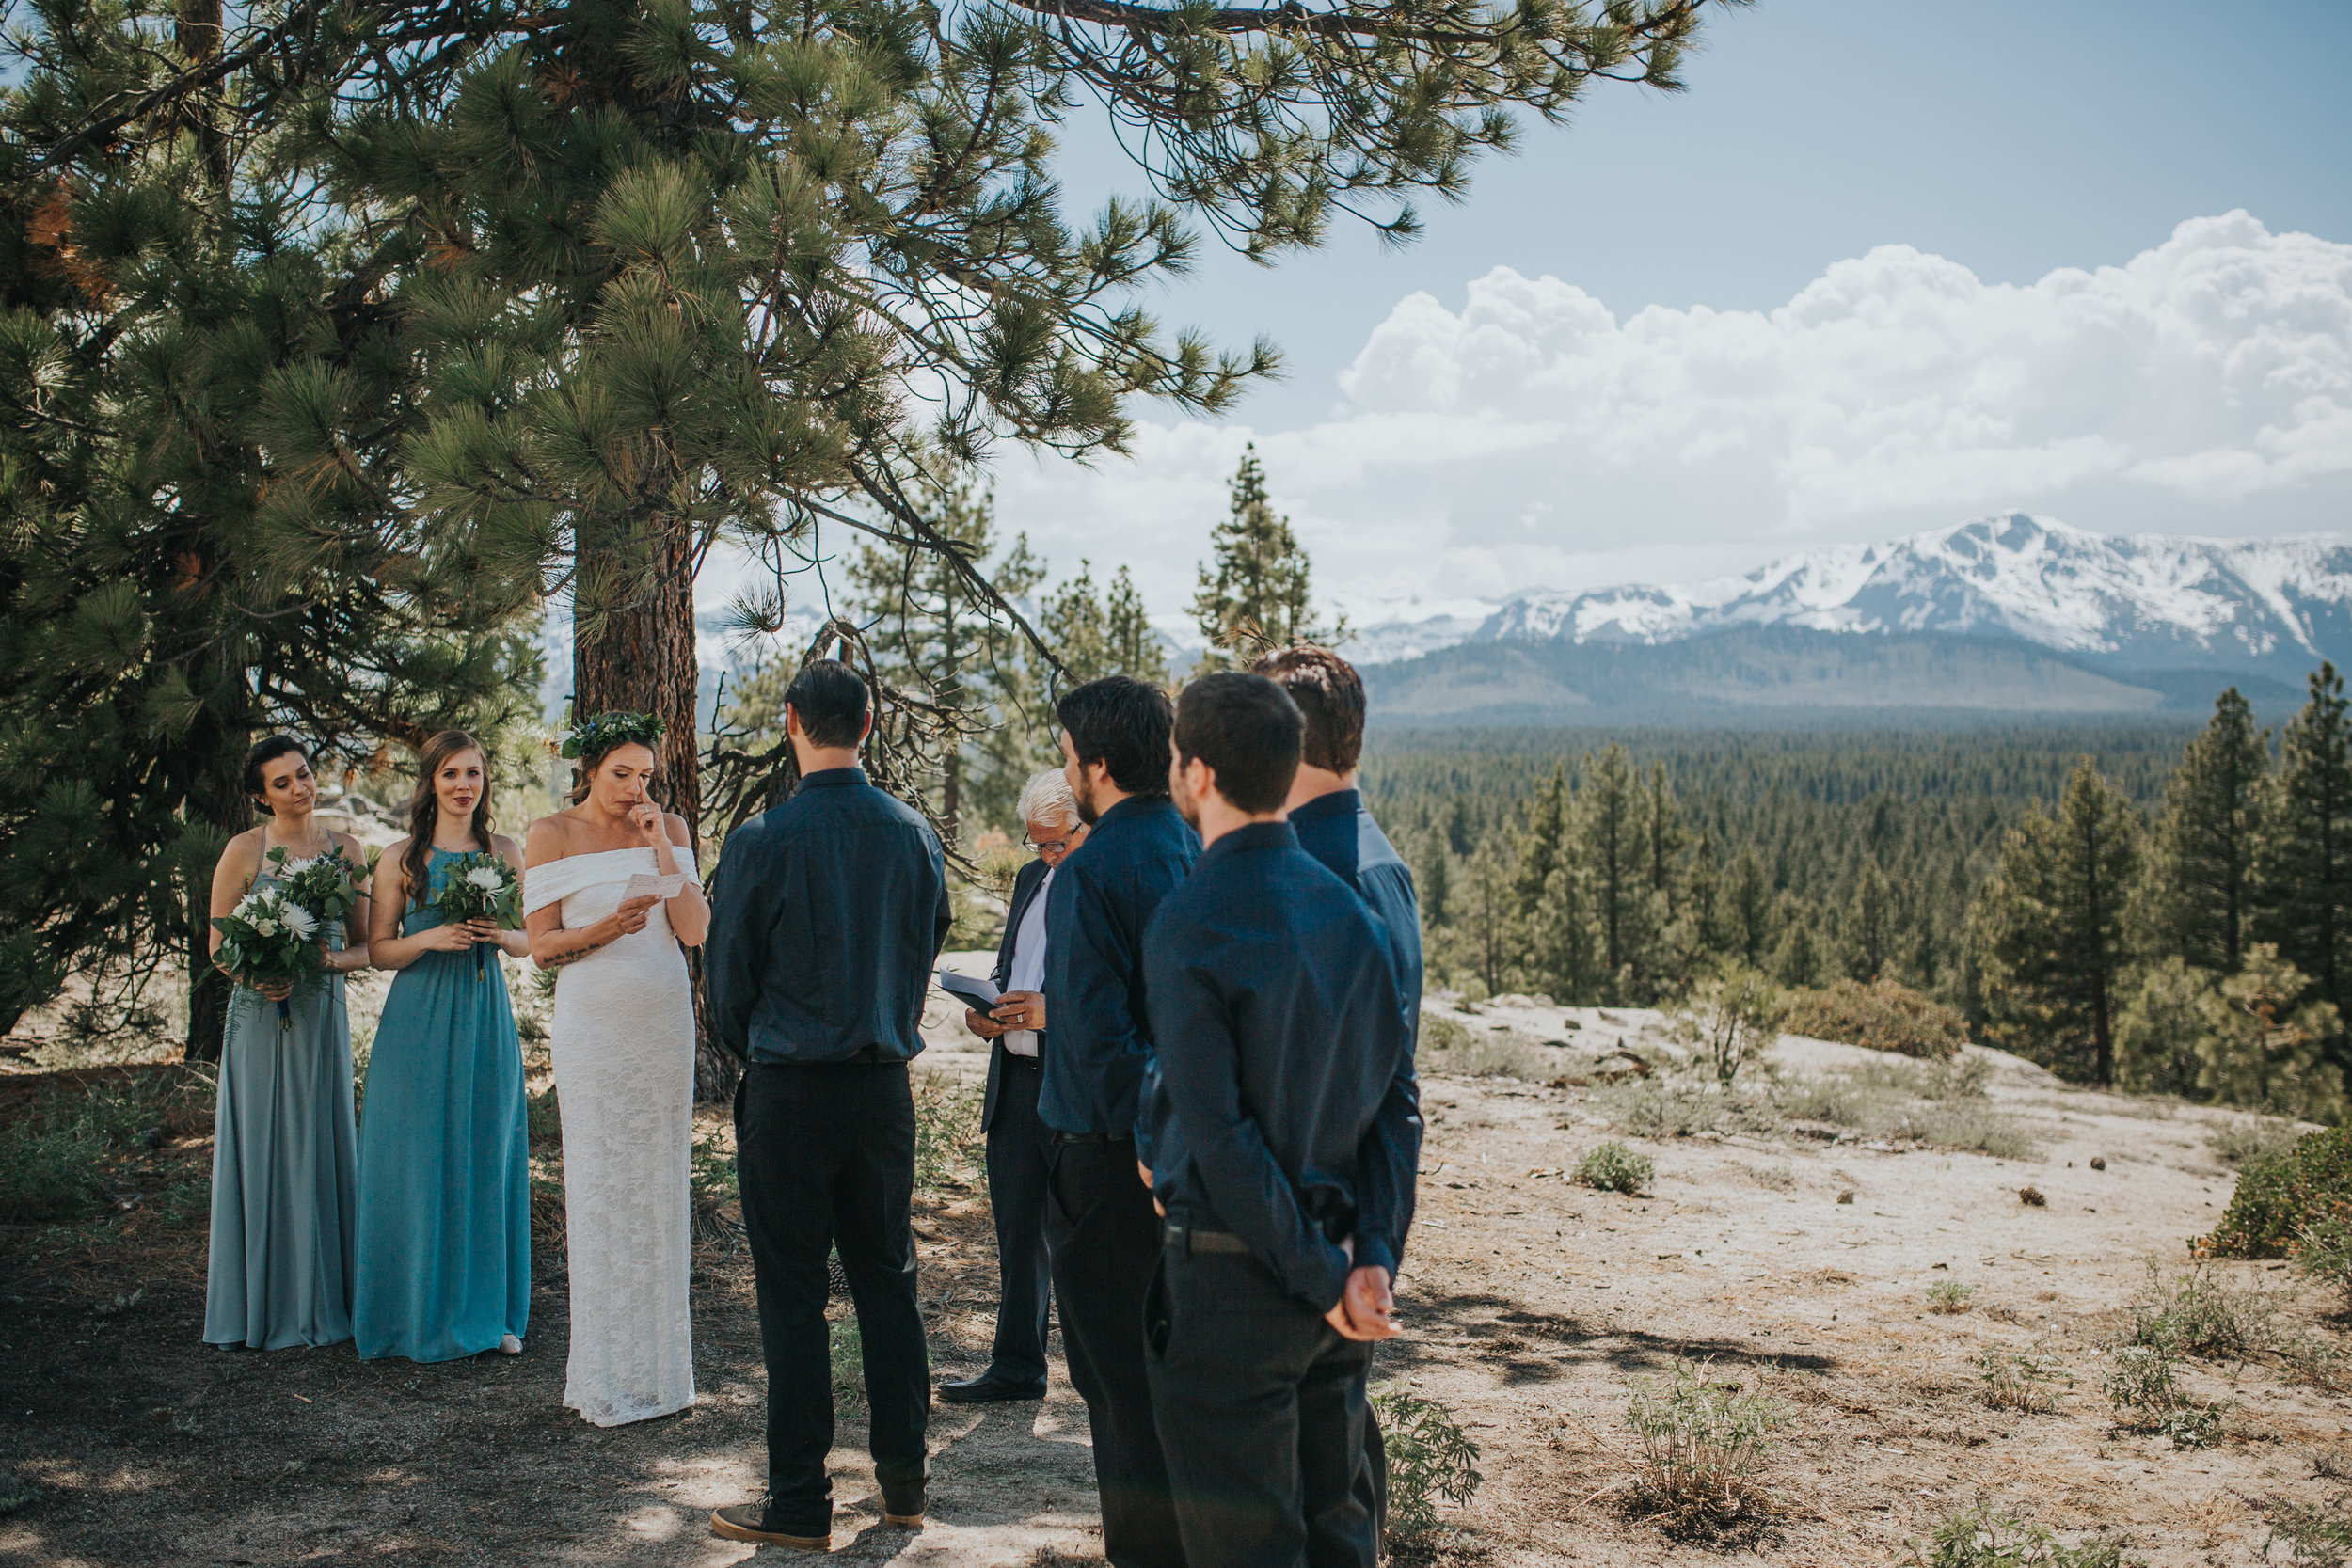 south-lake-tahoe-elopement-valerie-lendvay-photo-026.jpg